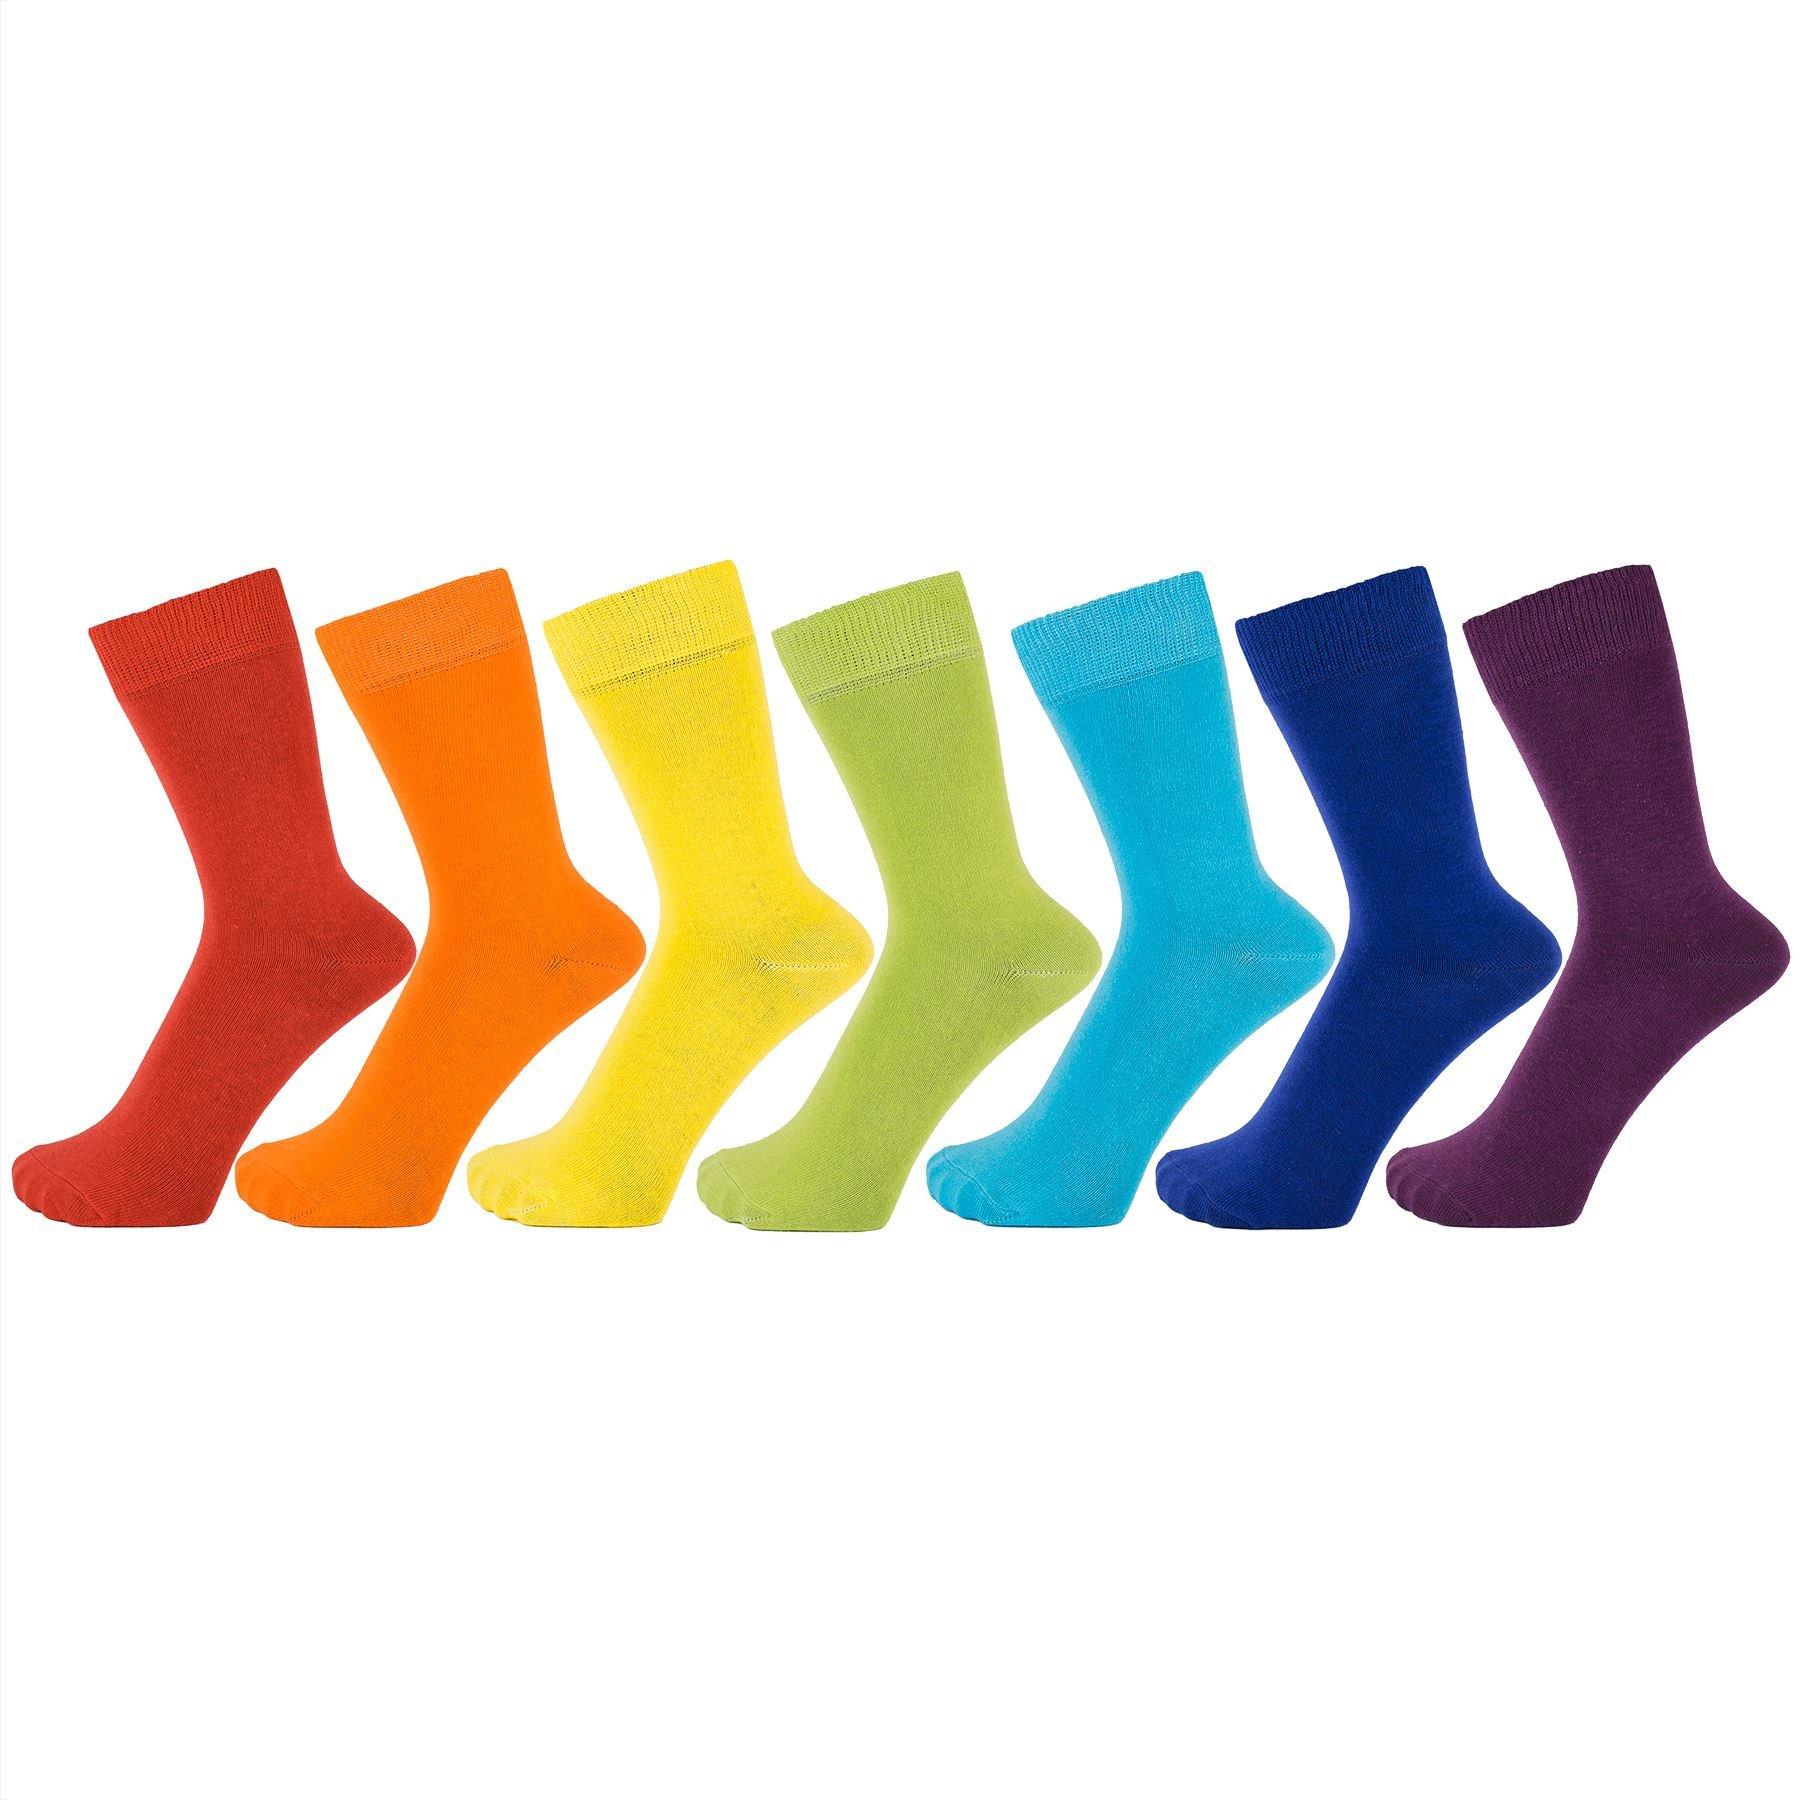 ZAKIRA Finest Combed Cotton Dress Socks in Plain Vivid Colours for Men, Women, 7-12 (US), Rainbow 7-pack